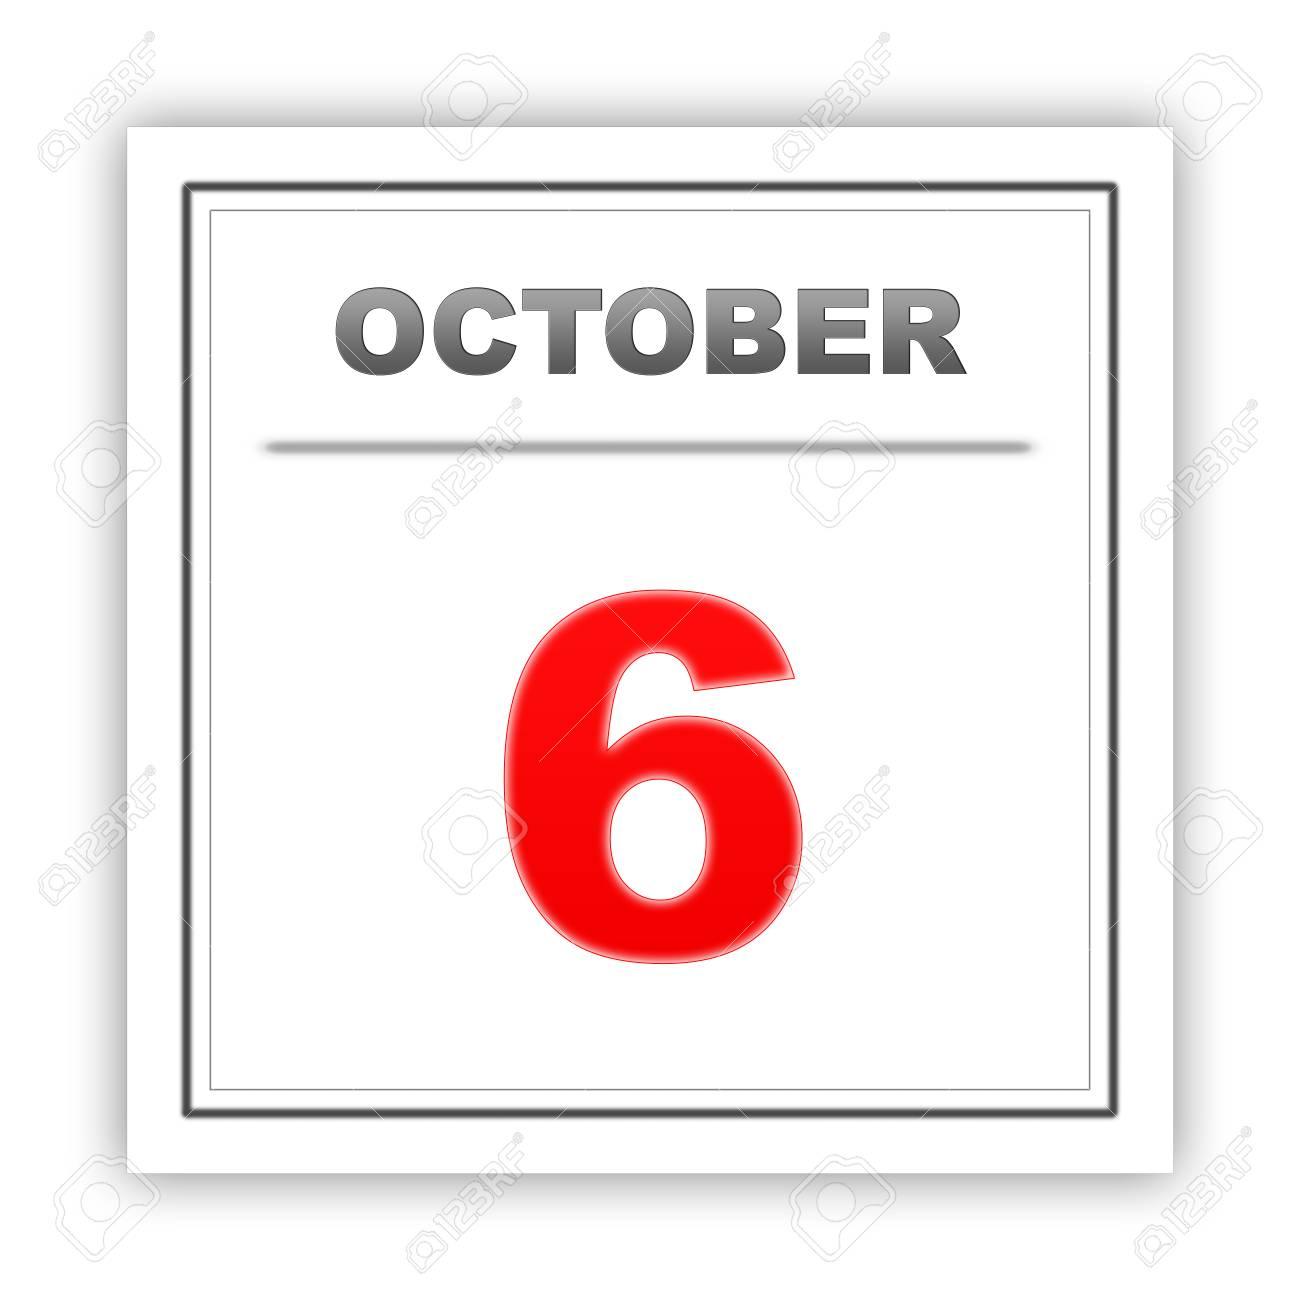 39319715-october-6-day-on-the-calendar-3d.jpg